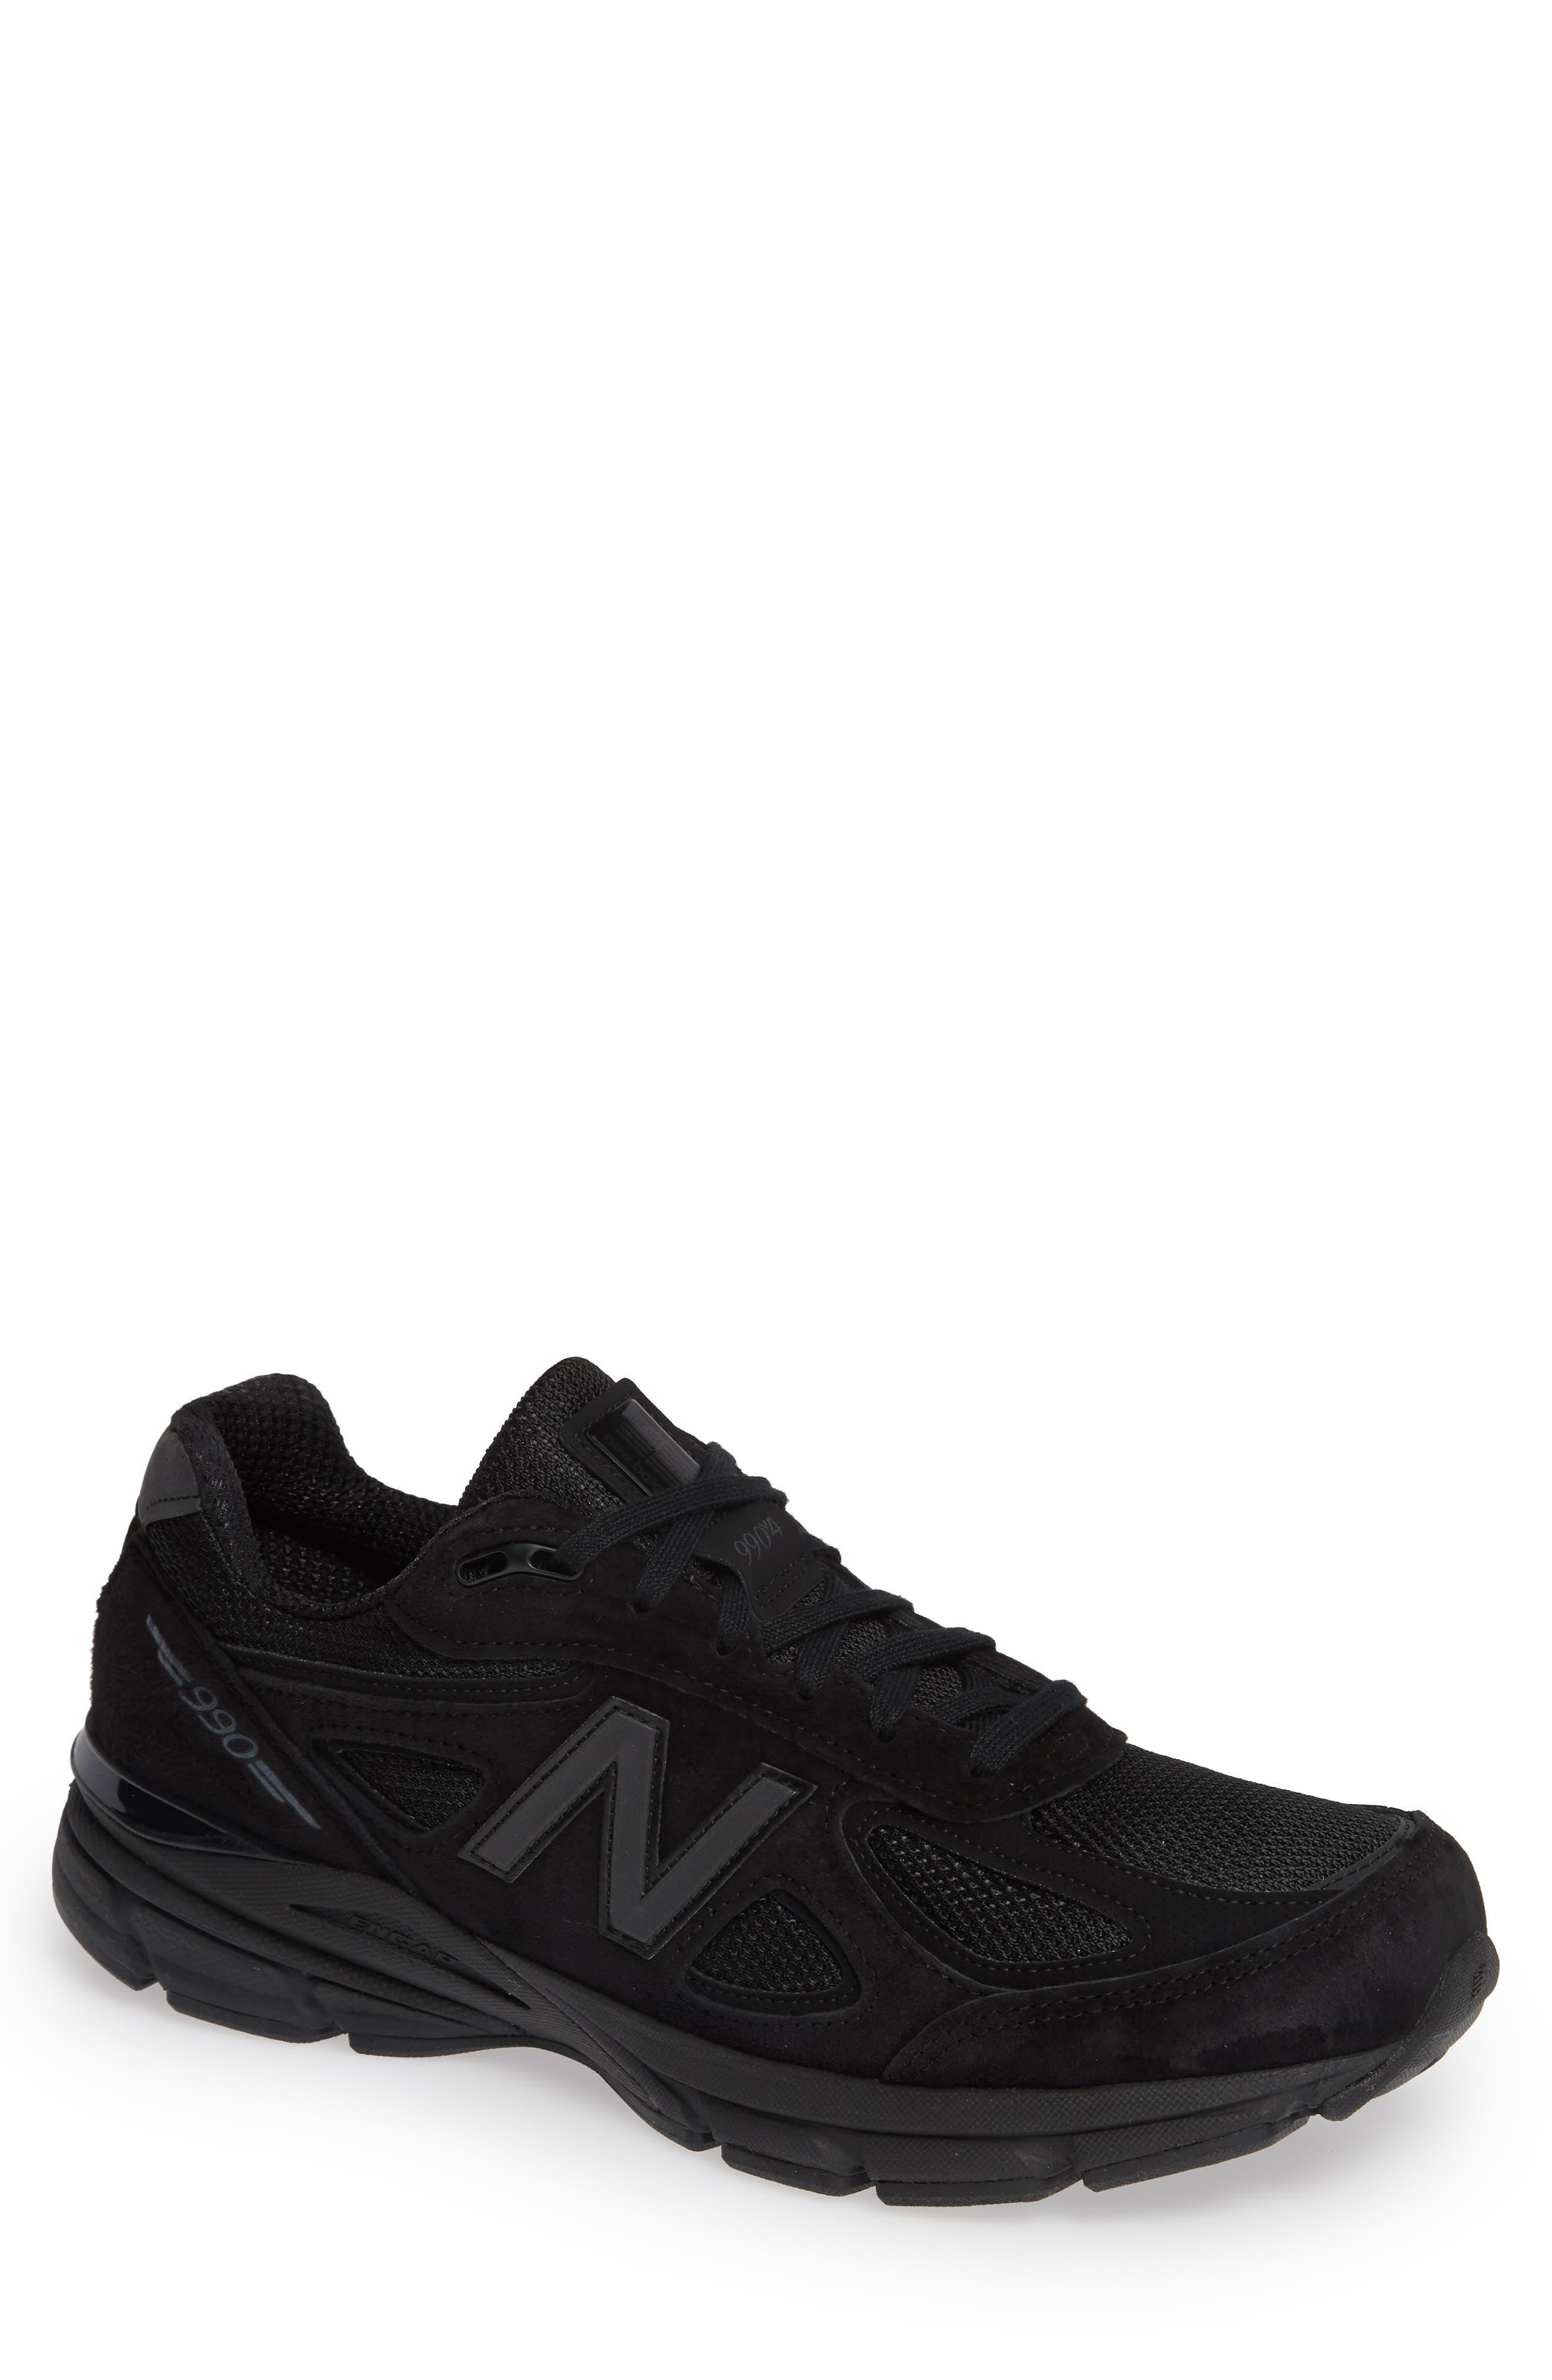 '990' Running Shoe,                         Main,                         color, BLACK/BLACk